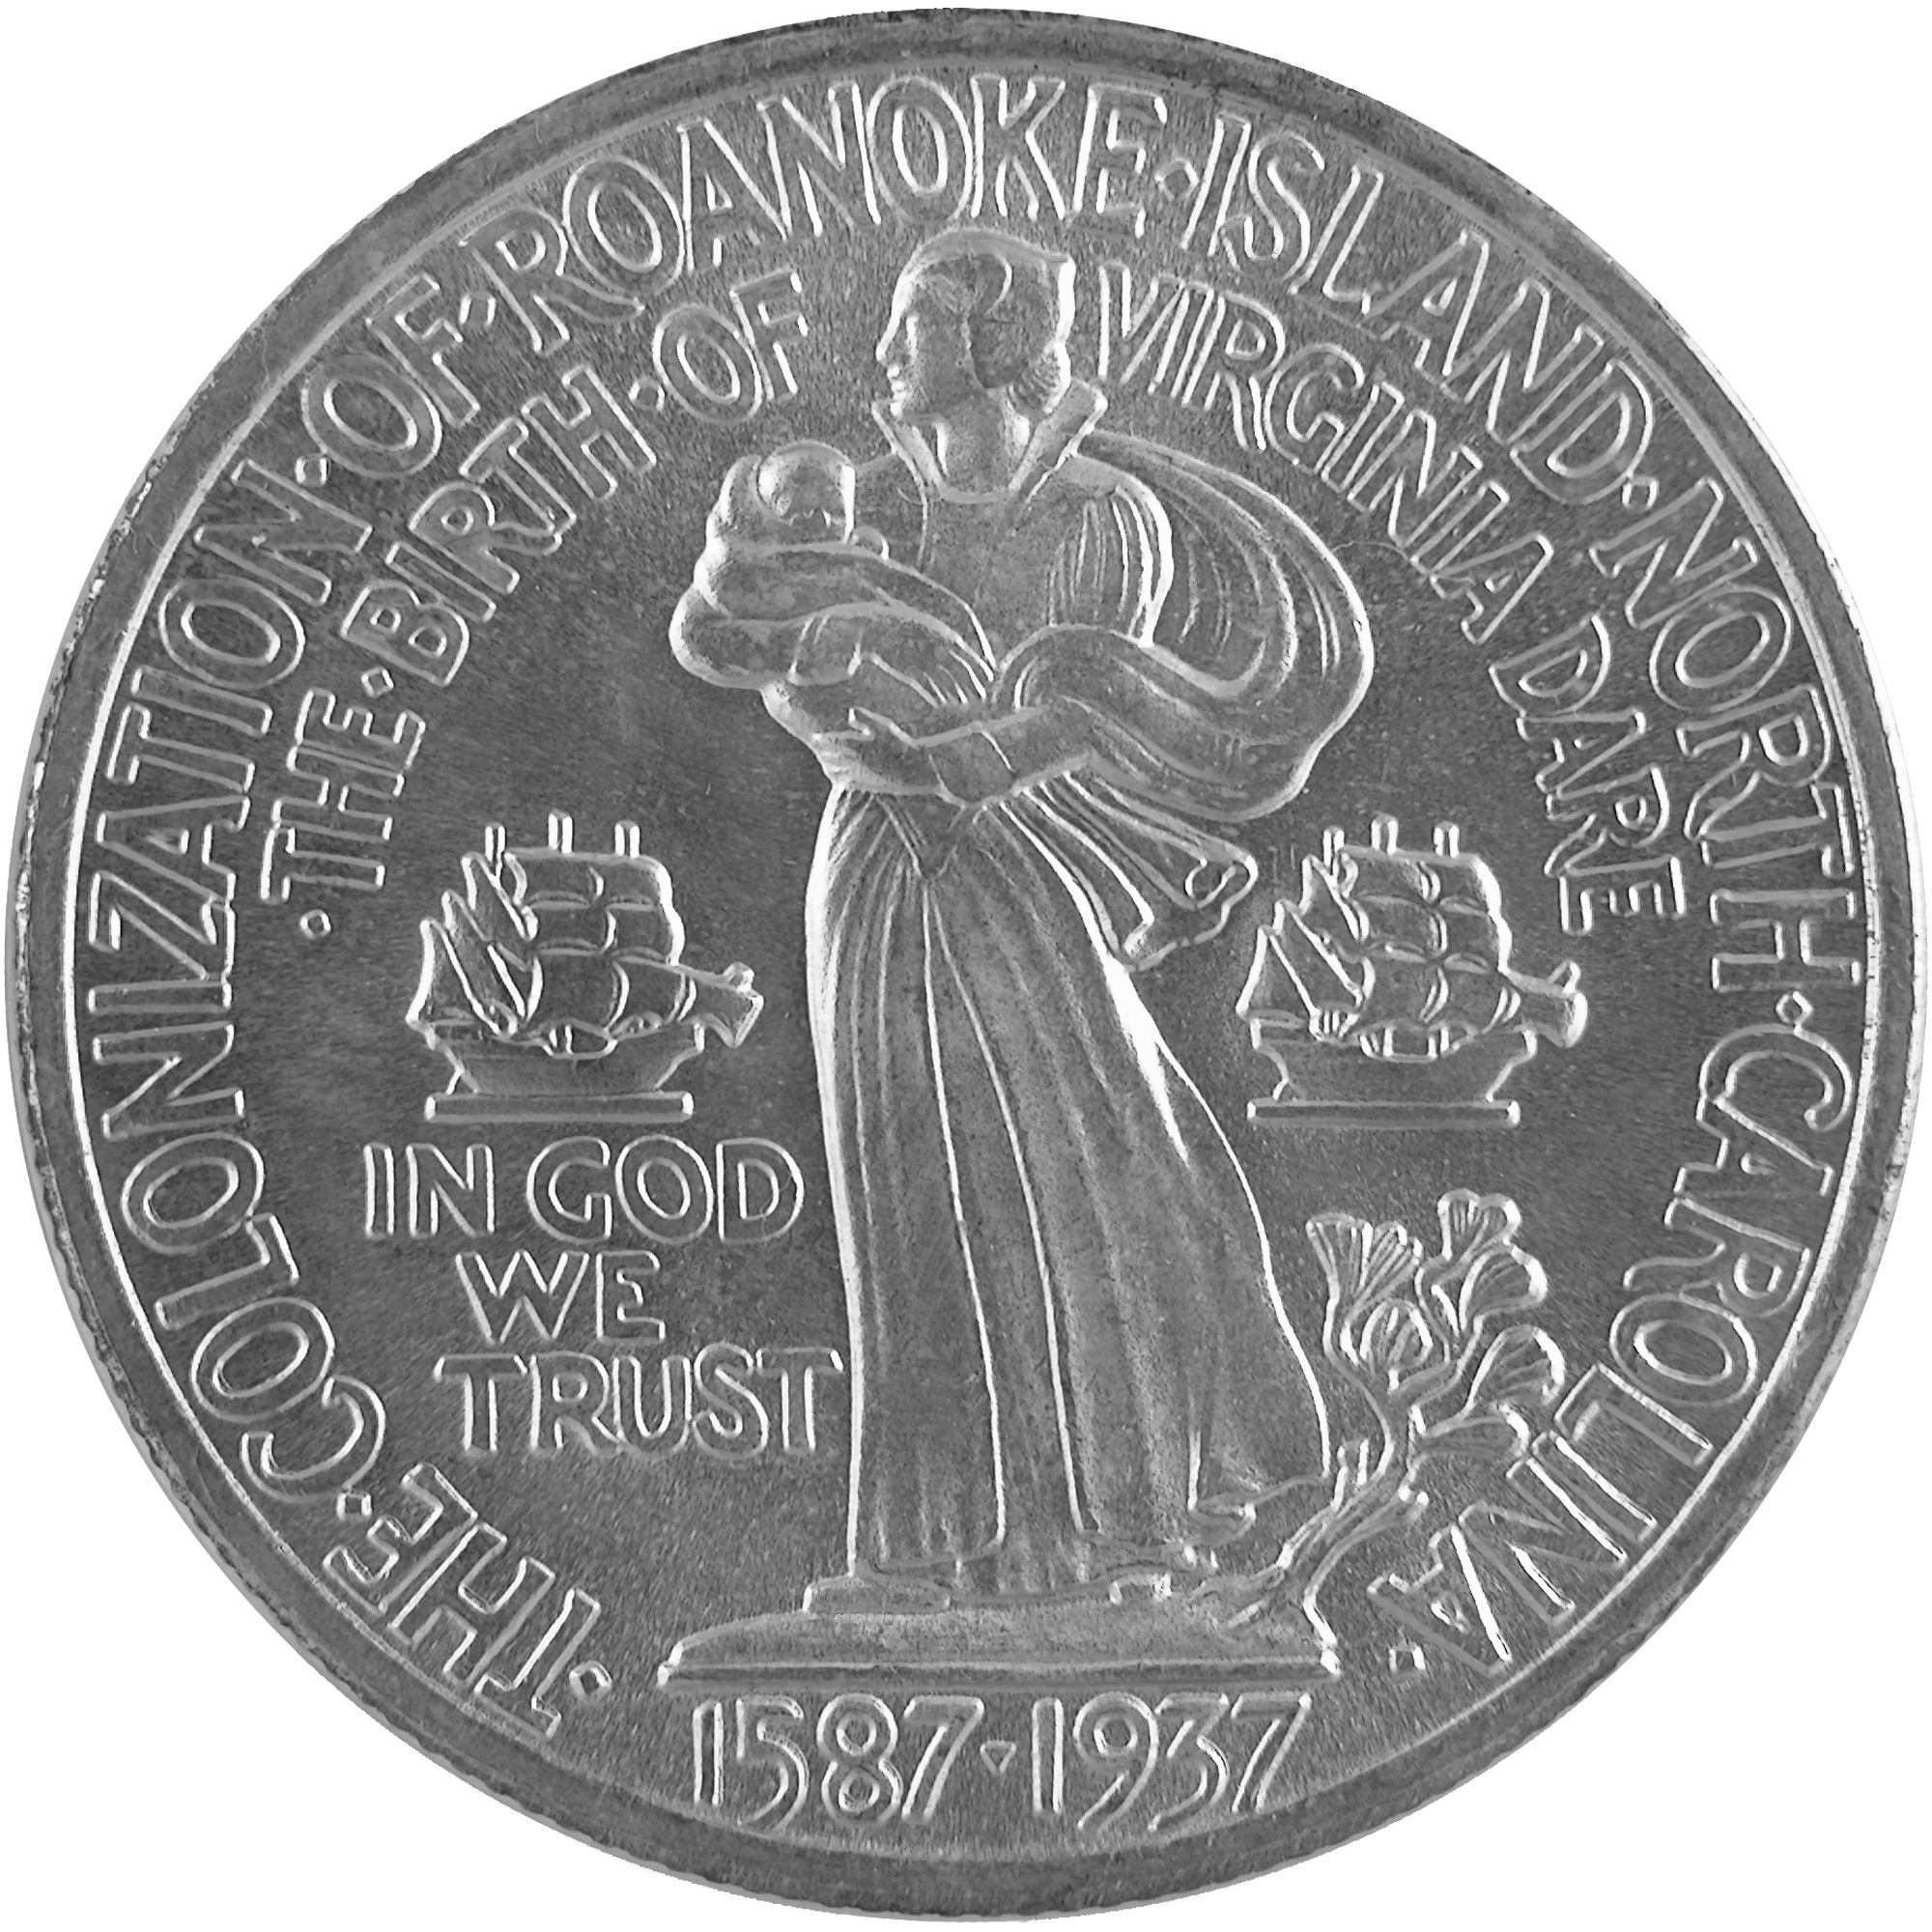 1937 Roanoke Island North Carolina Commemorative Silver Half Dollar Coin Reverse